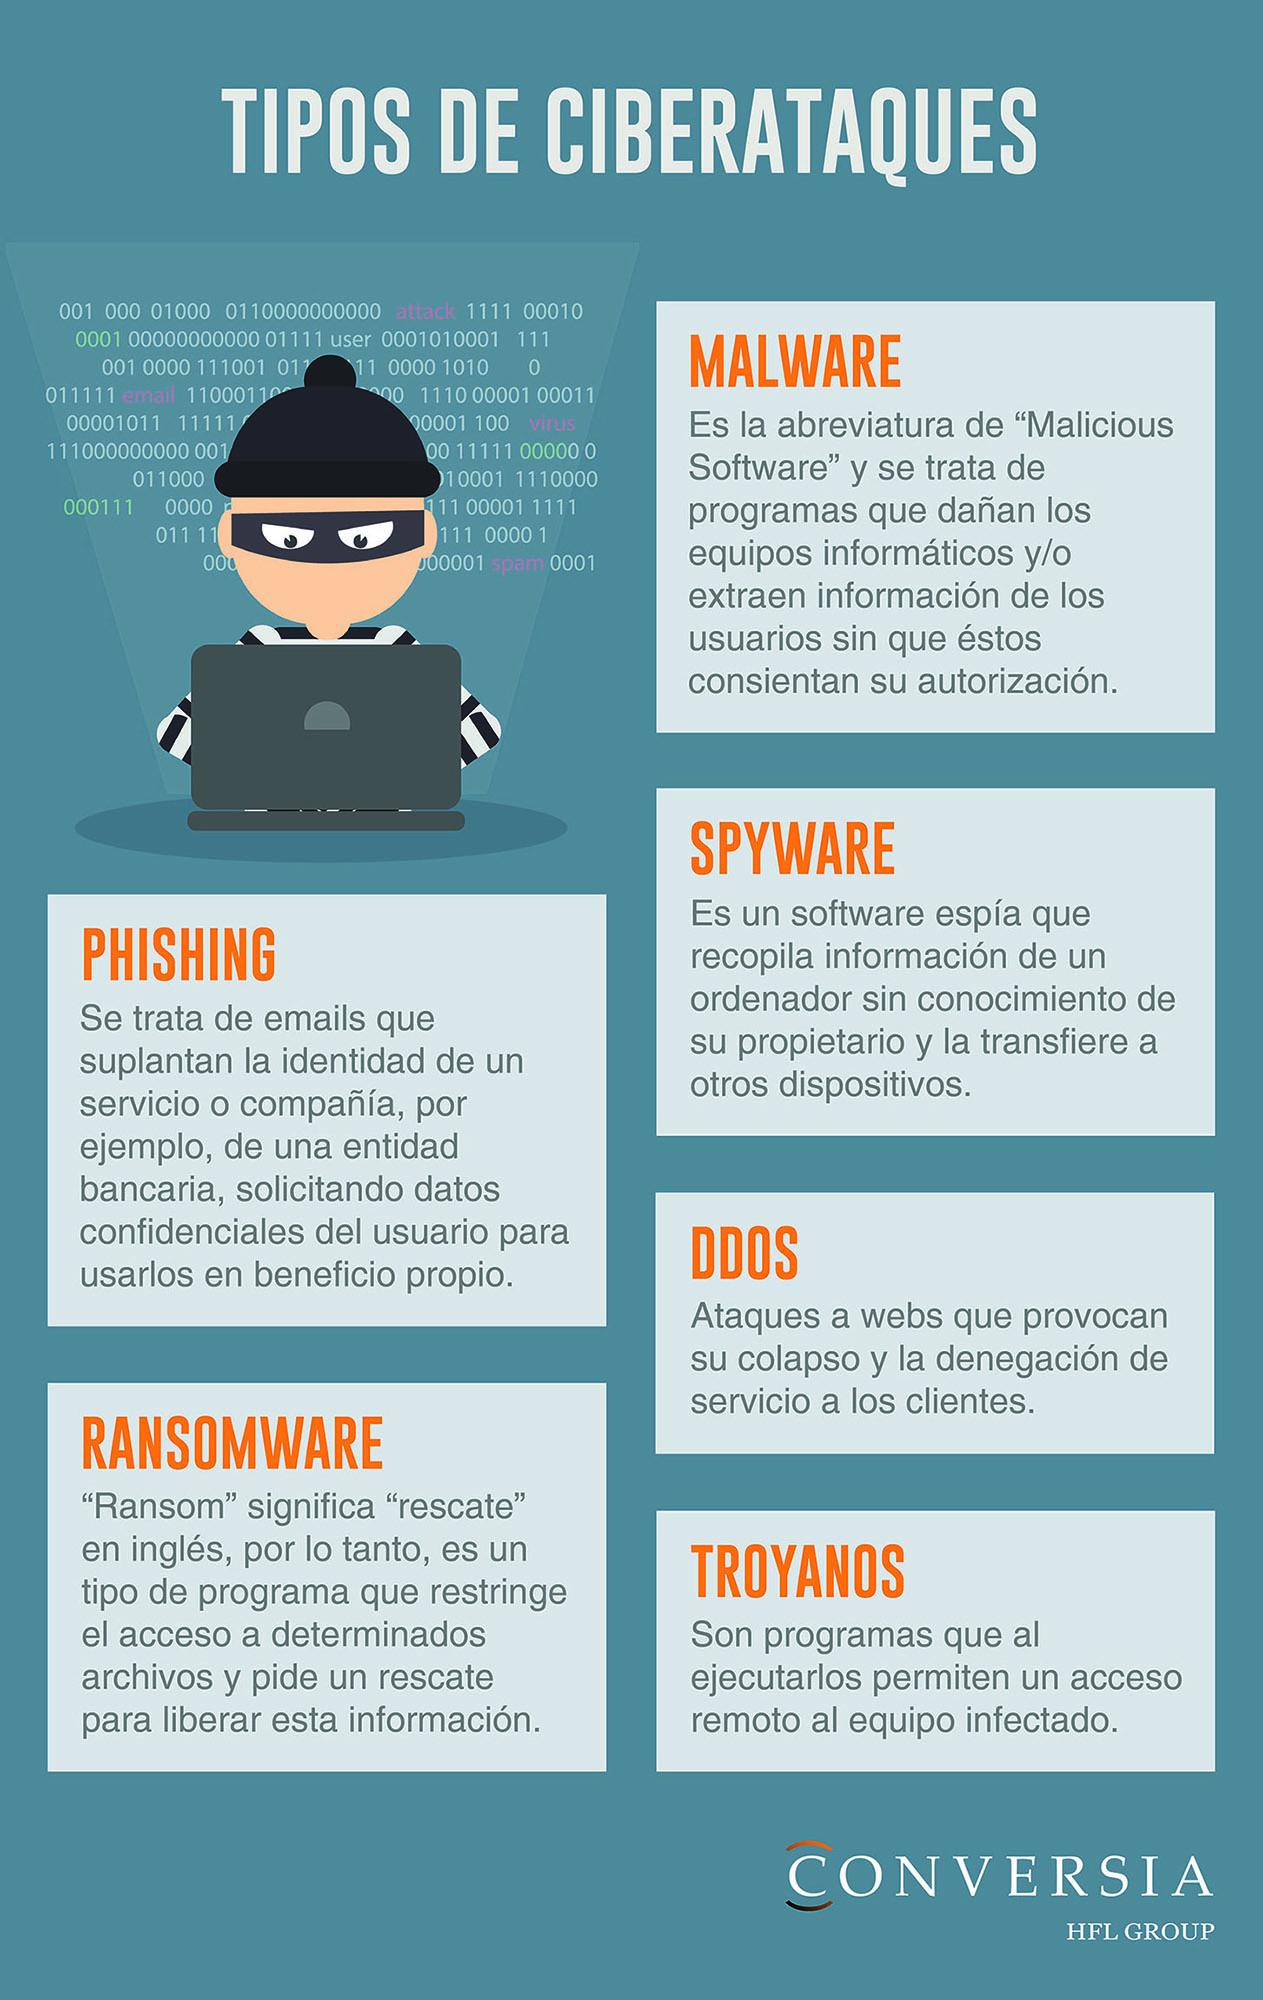 Tipos de ciberataques: más allá del ransomware